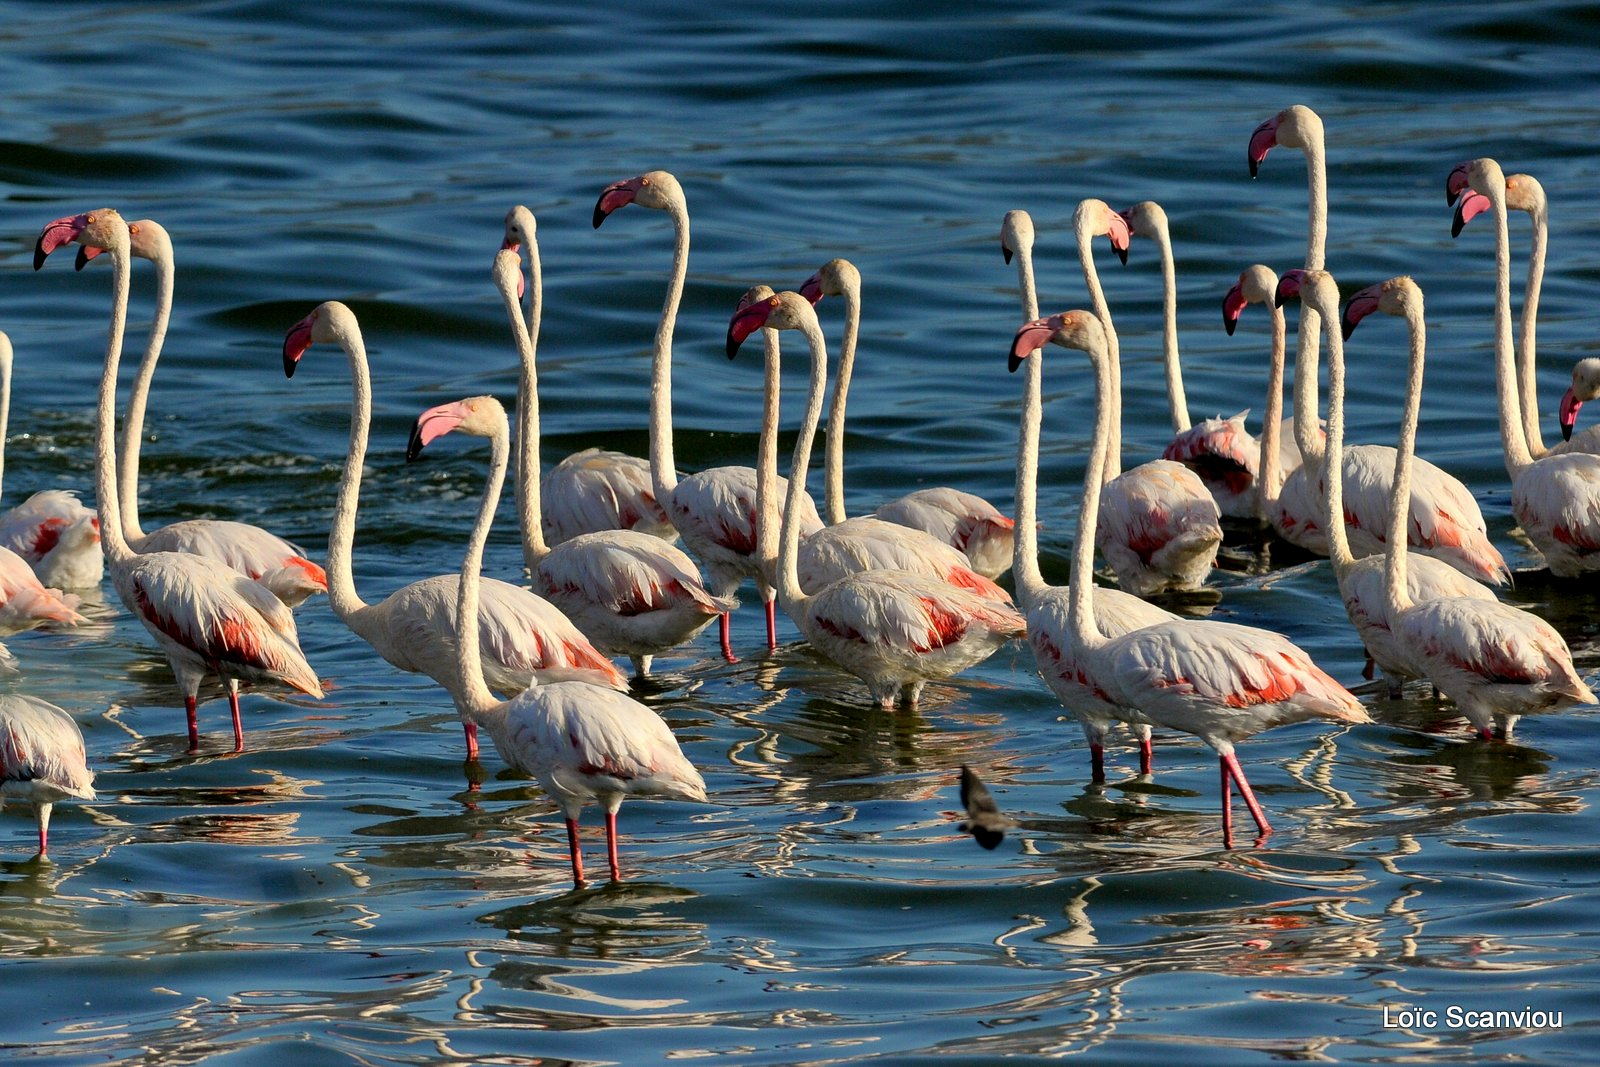 Flamants roses/Flamingoes (4)